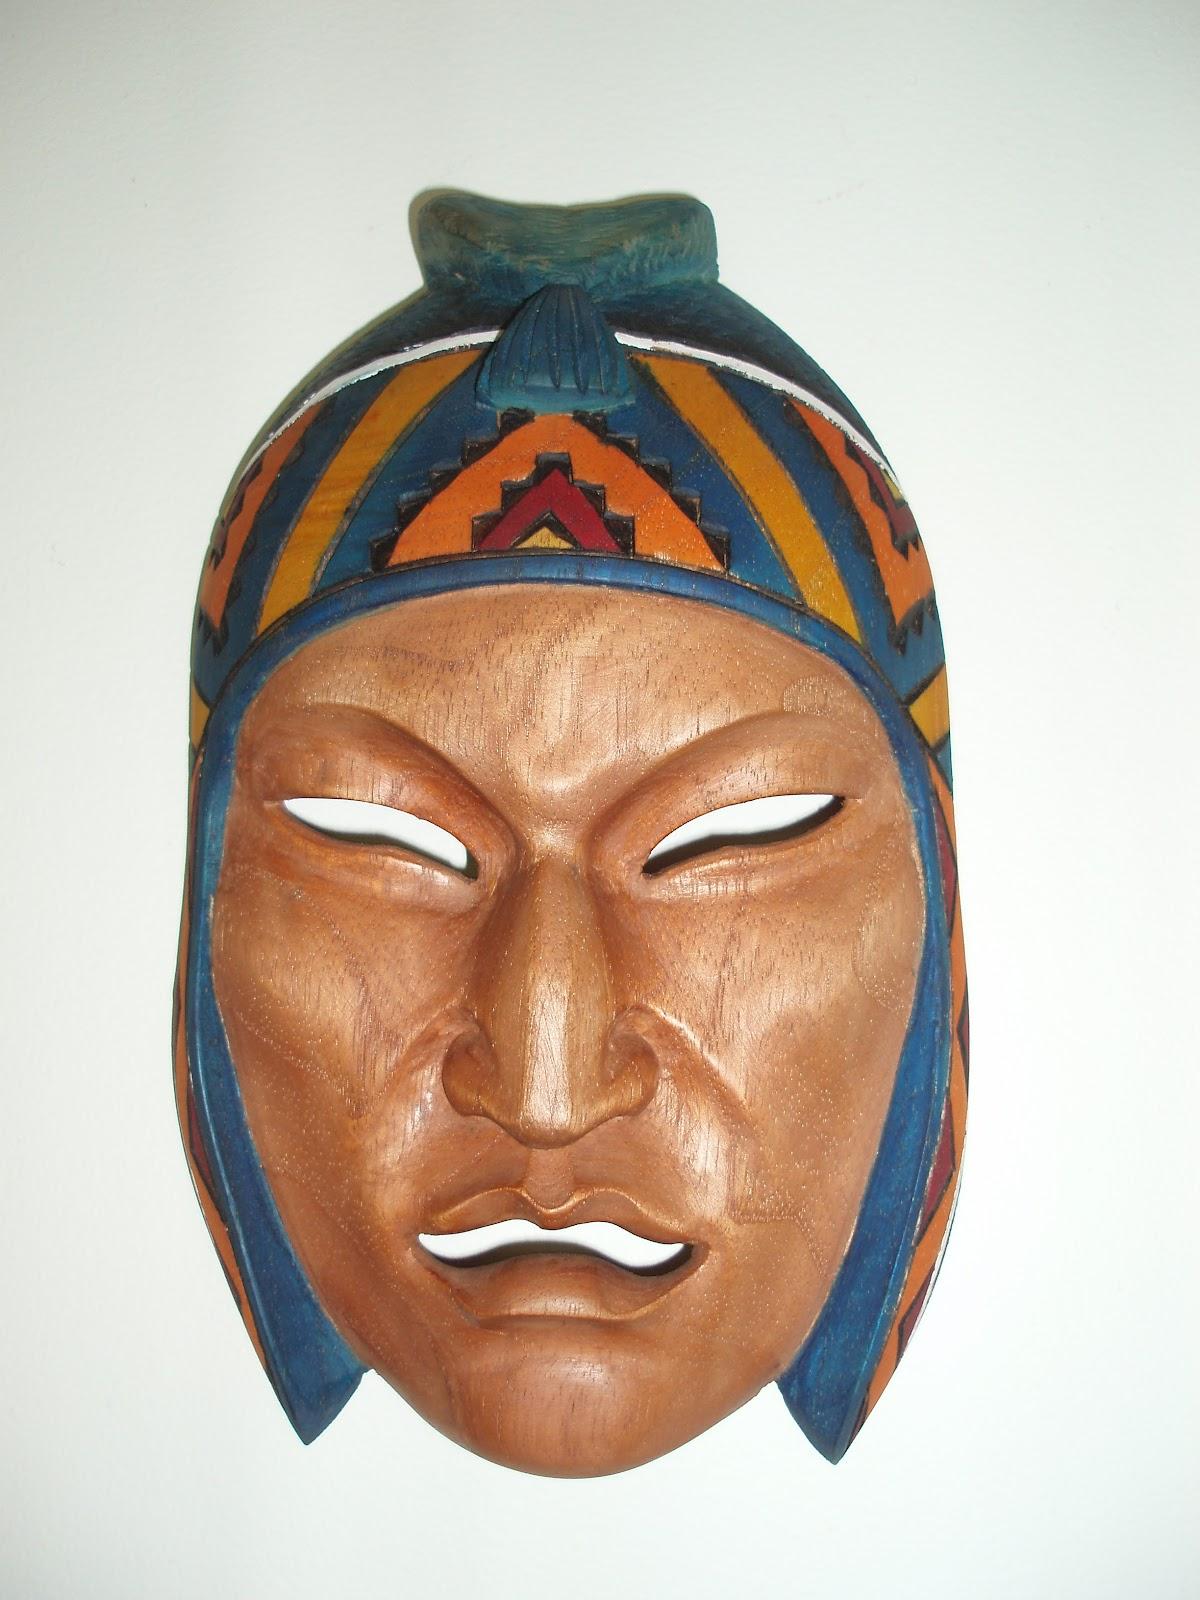 Masks of the World - Mascaras del Mundo: August 2011